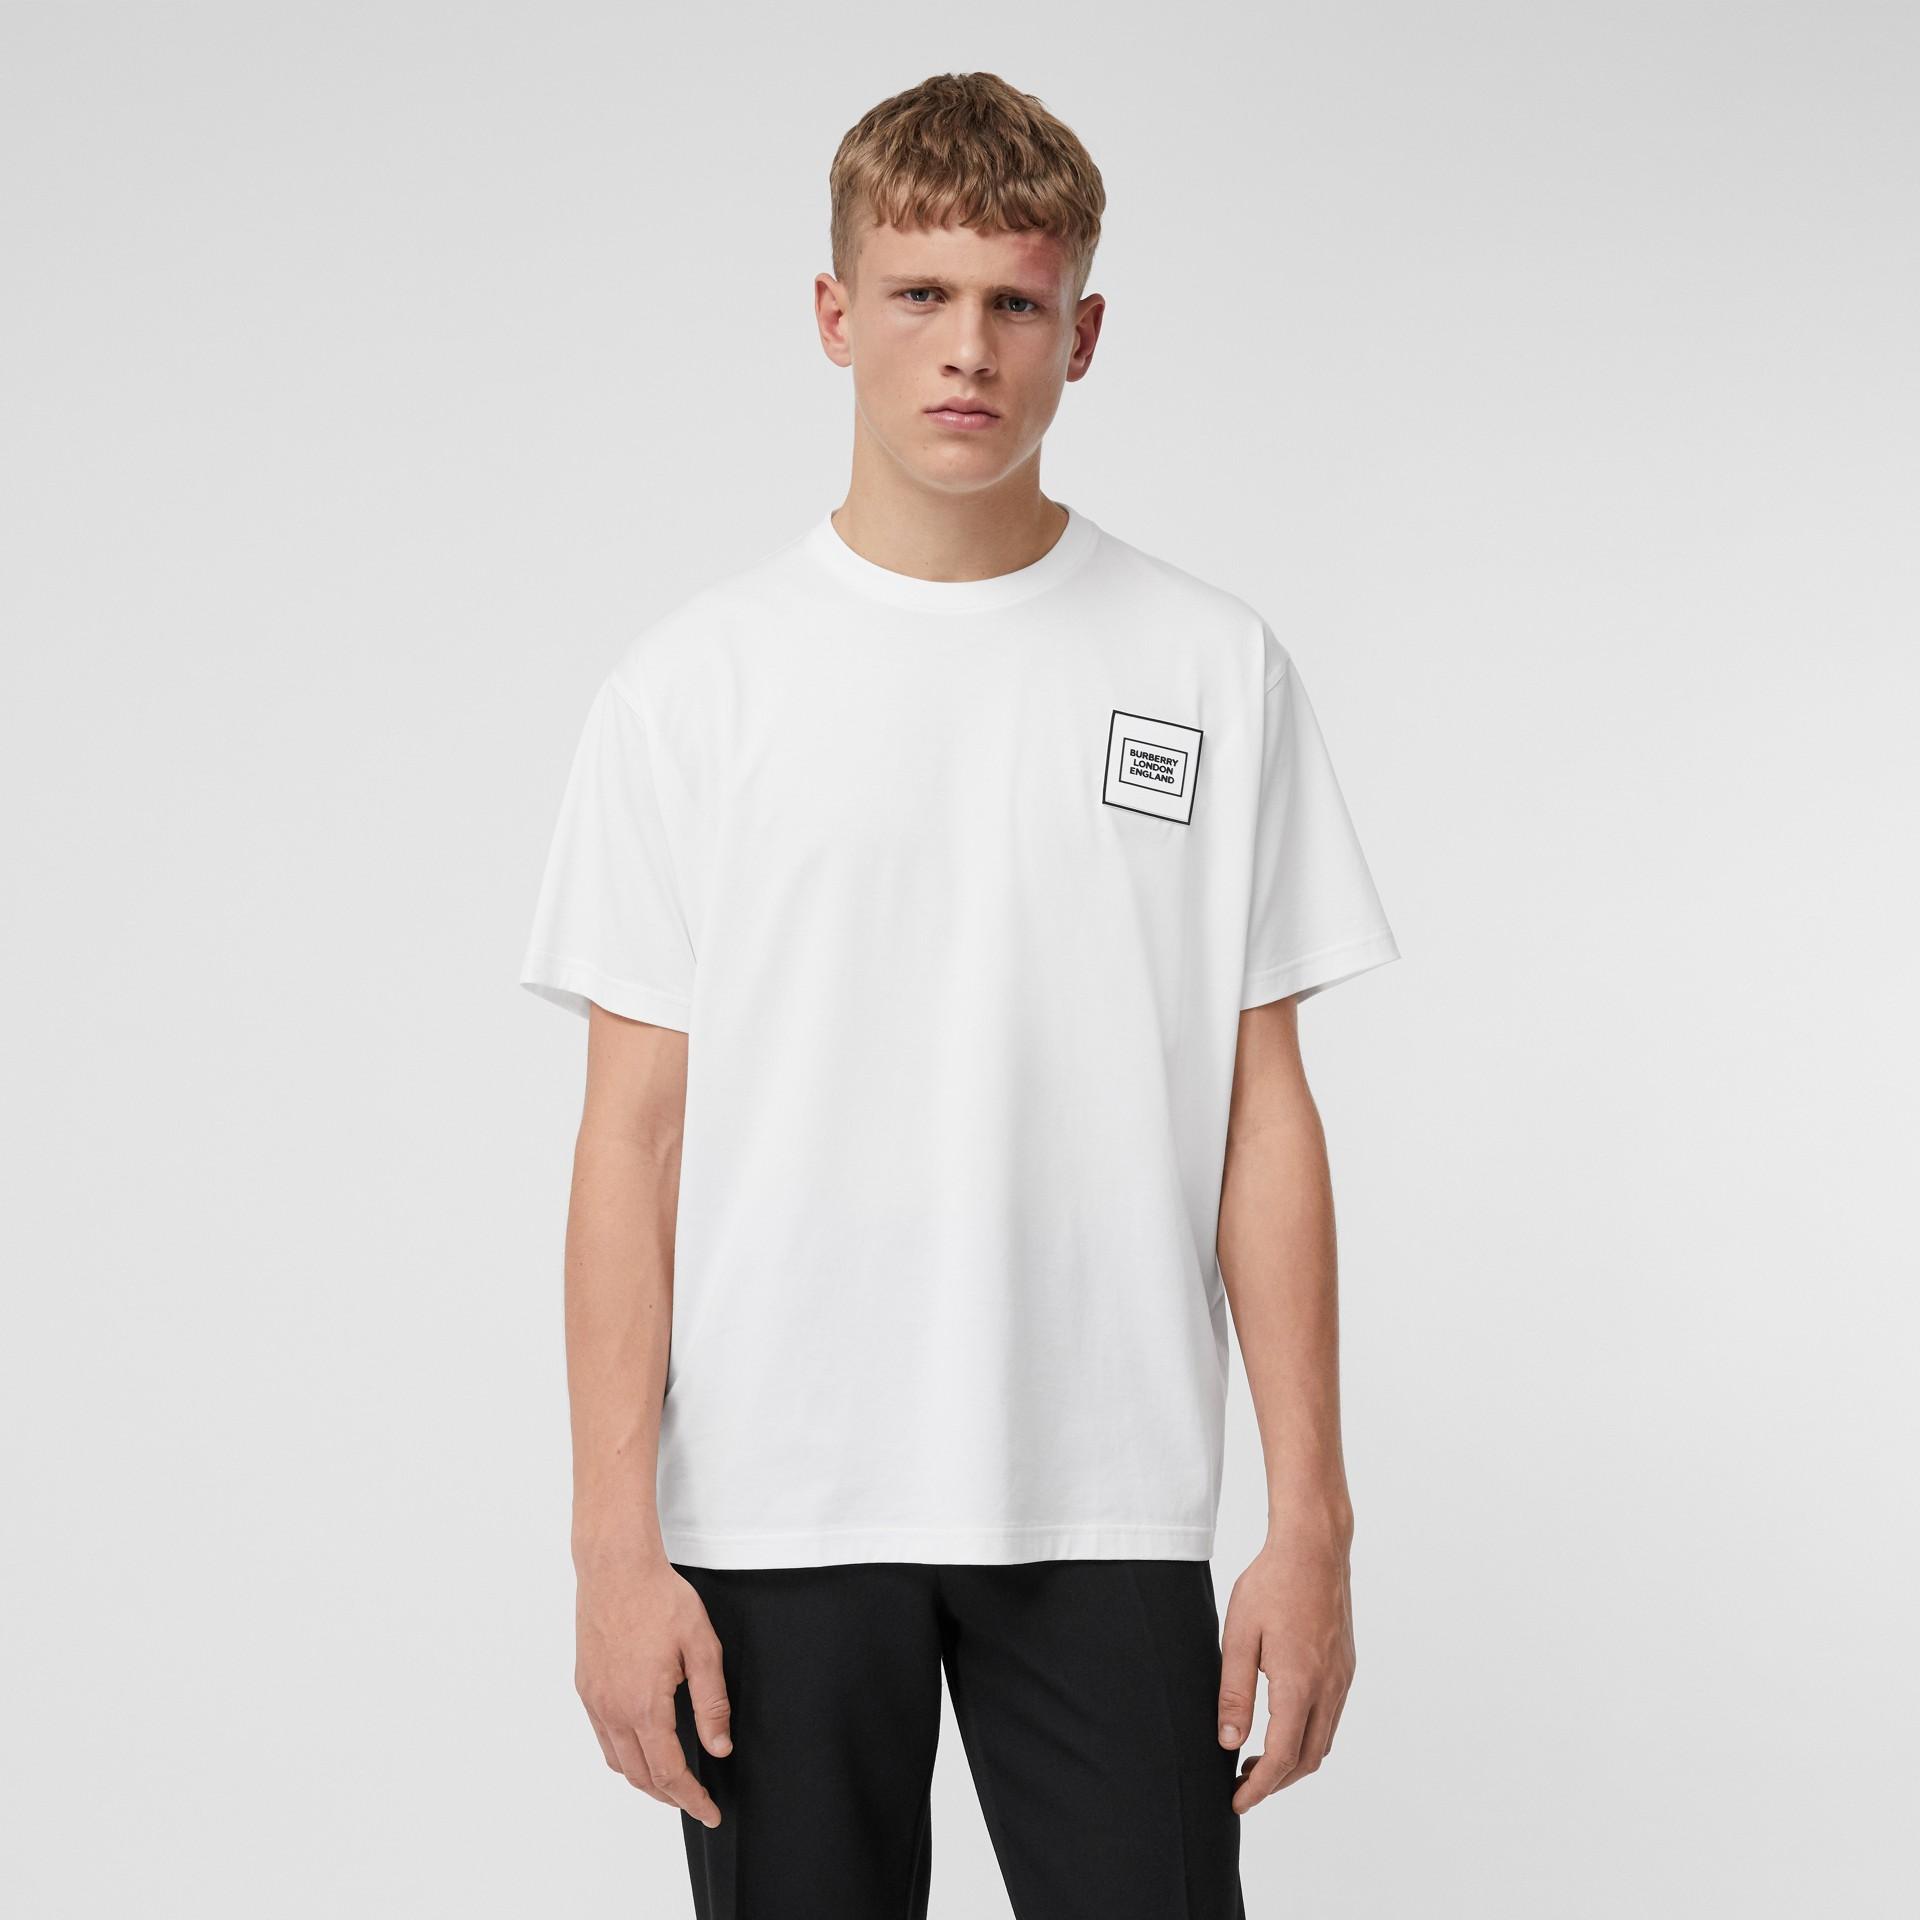 Logo Appliqué Cotton T-shirt in White - Men | Burberry Hong Kong S.A.R - gallery image 0